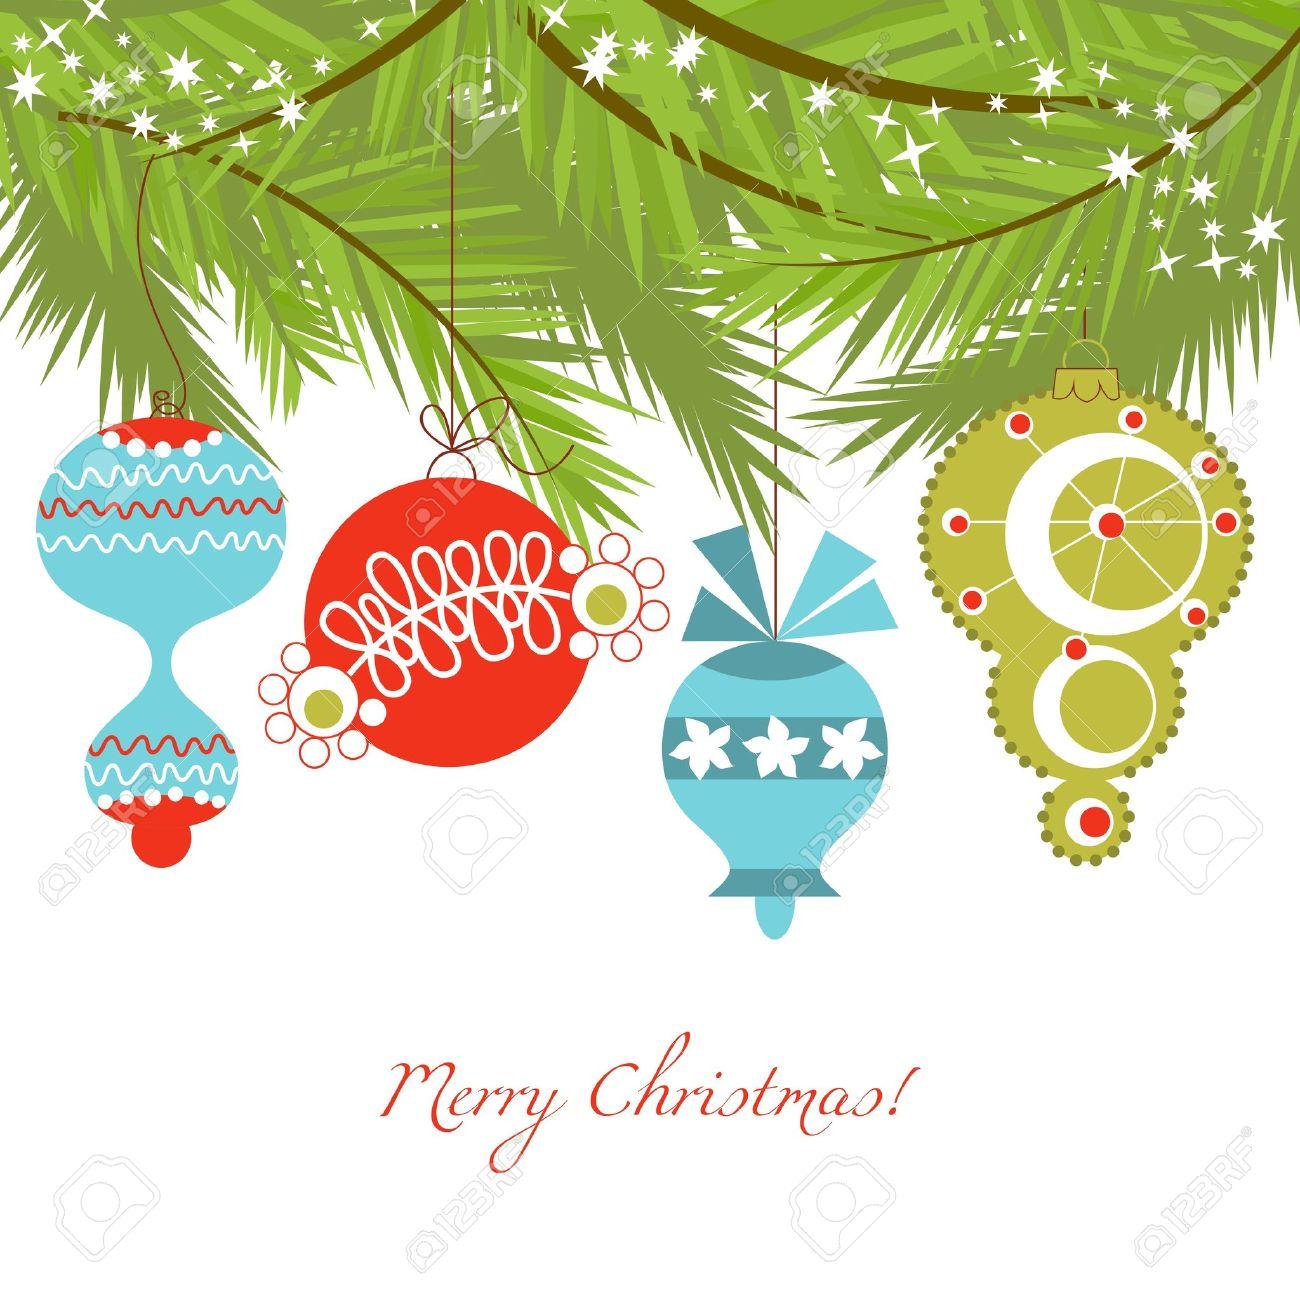 Christmas Ornaments: Christmas Ornaments Vector Background Illustration